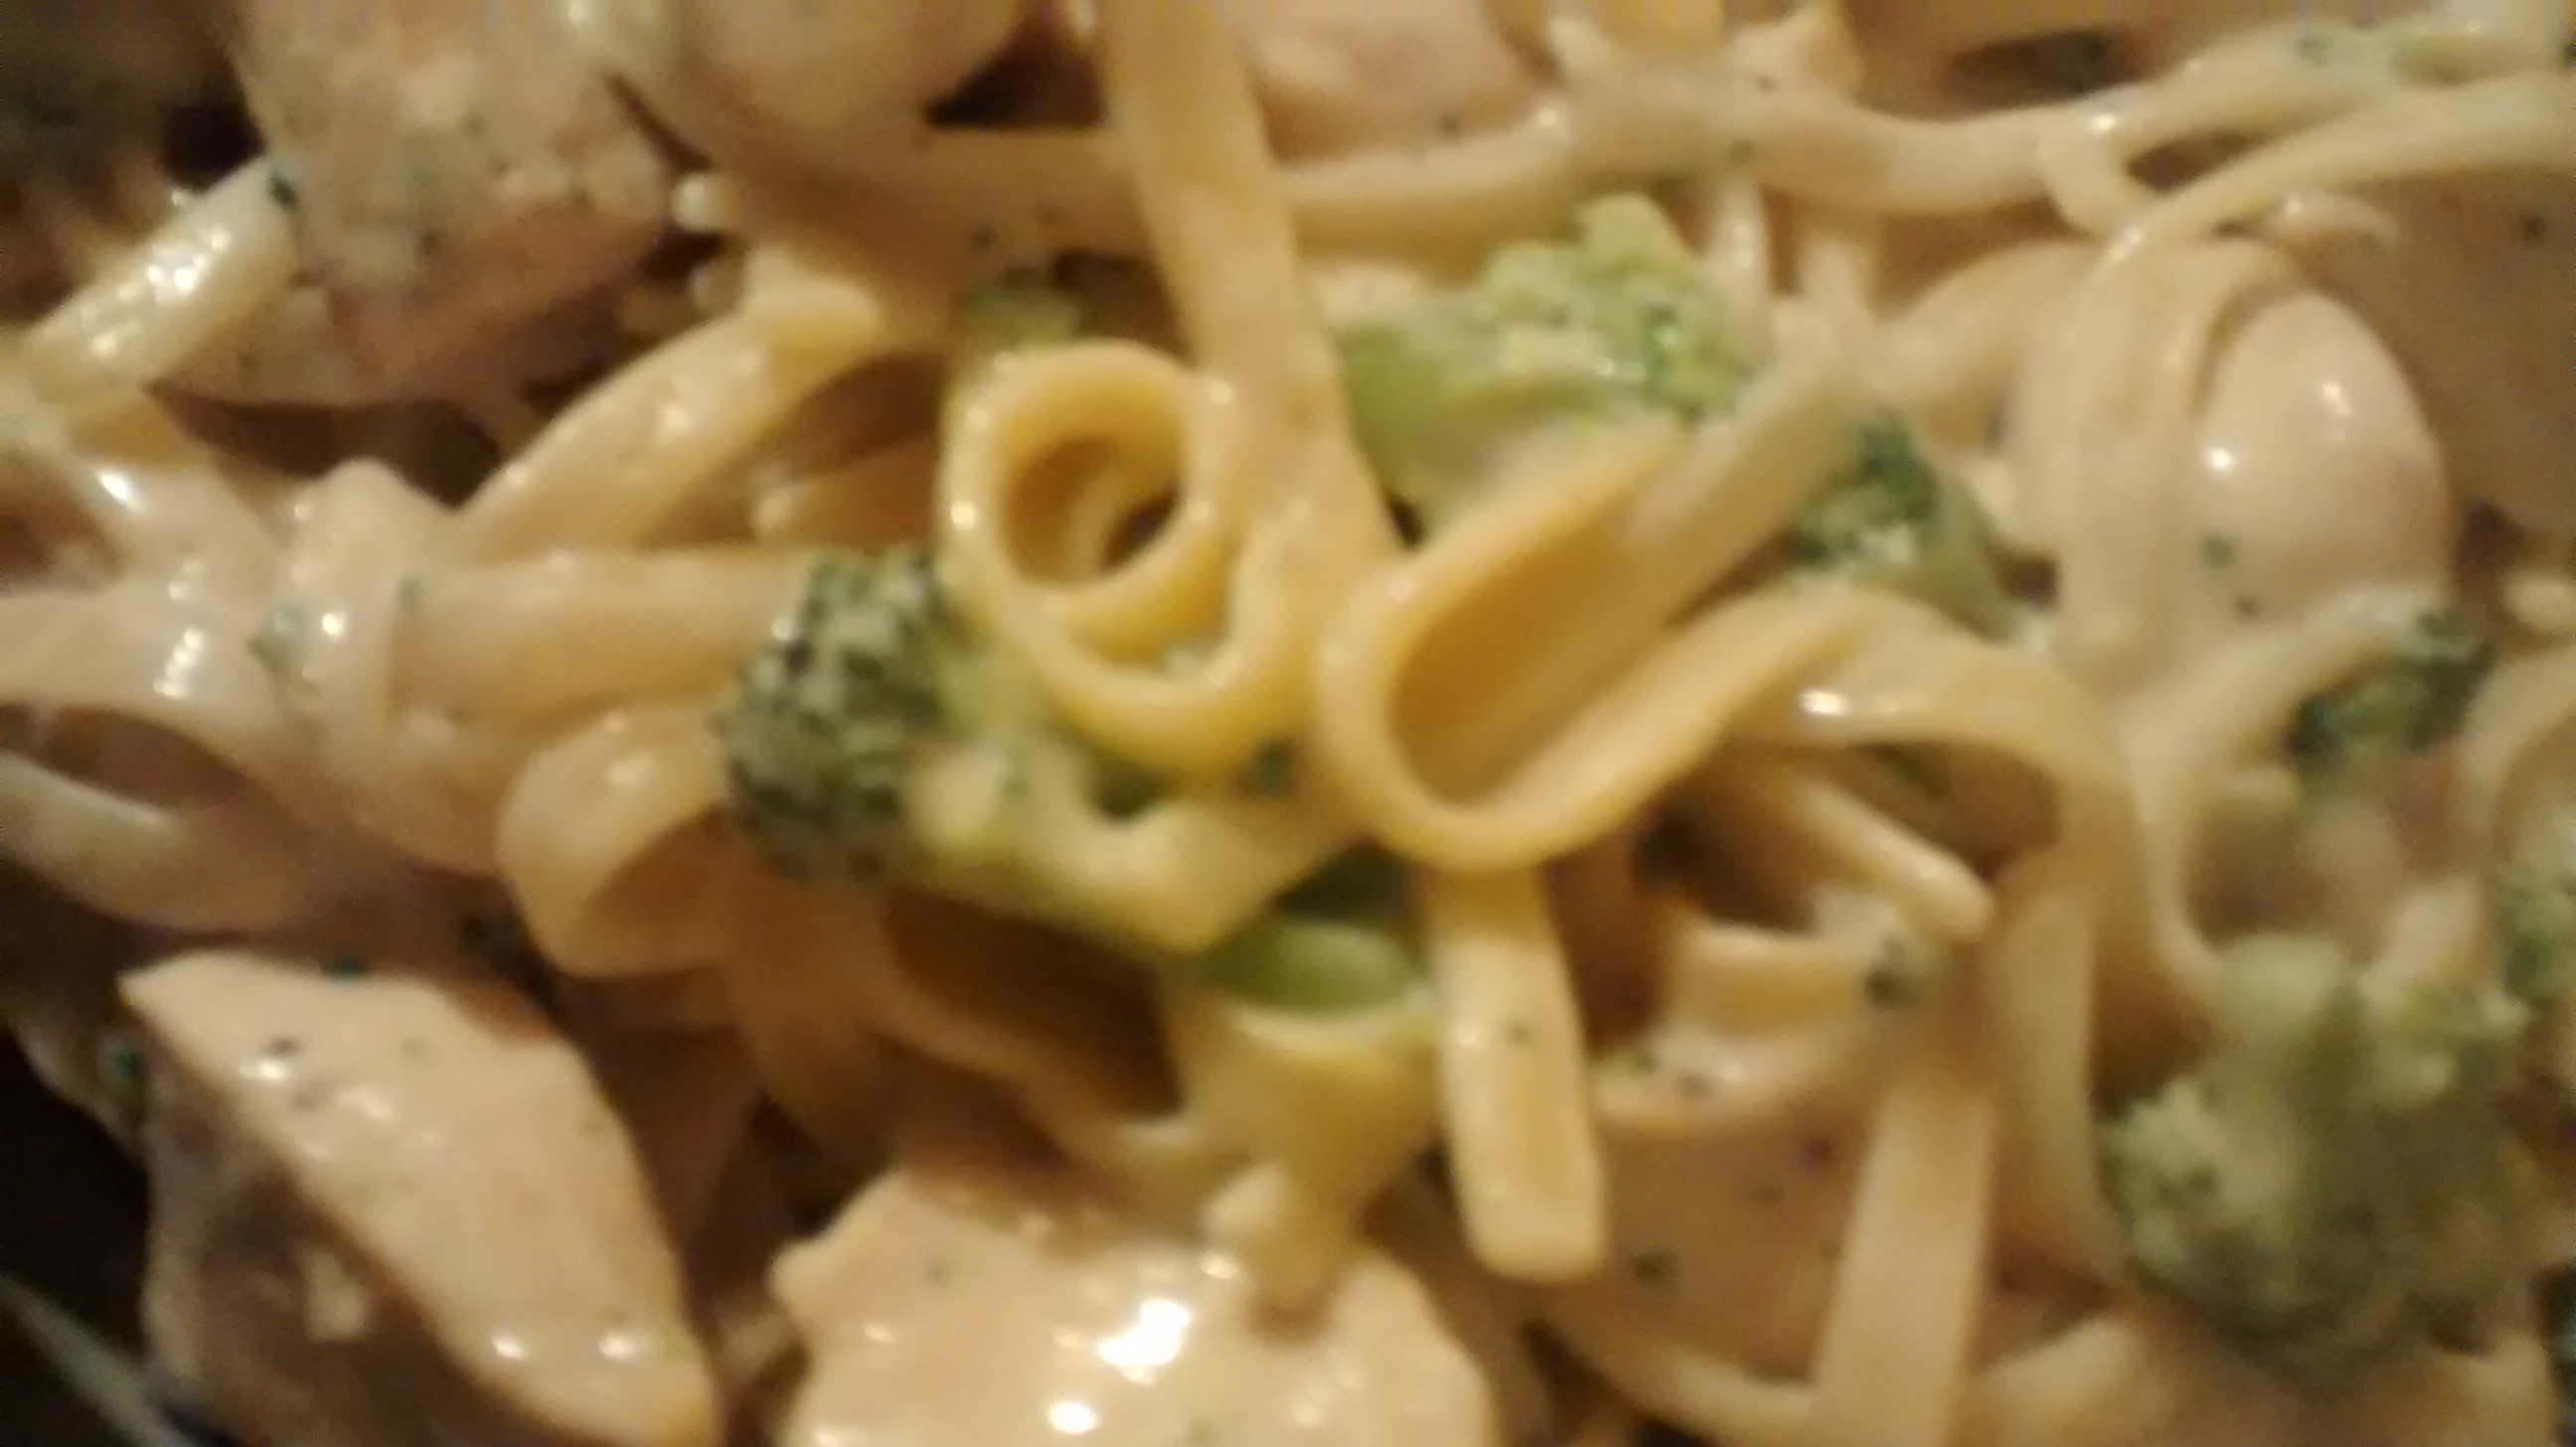 Chicken & Broccoli Alfredo with Fettuccine Trish Godwin